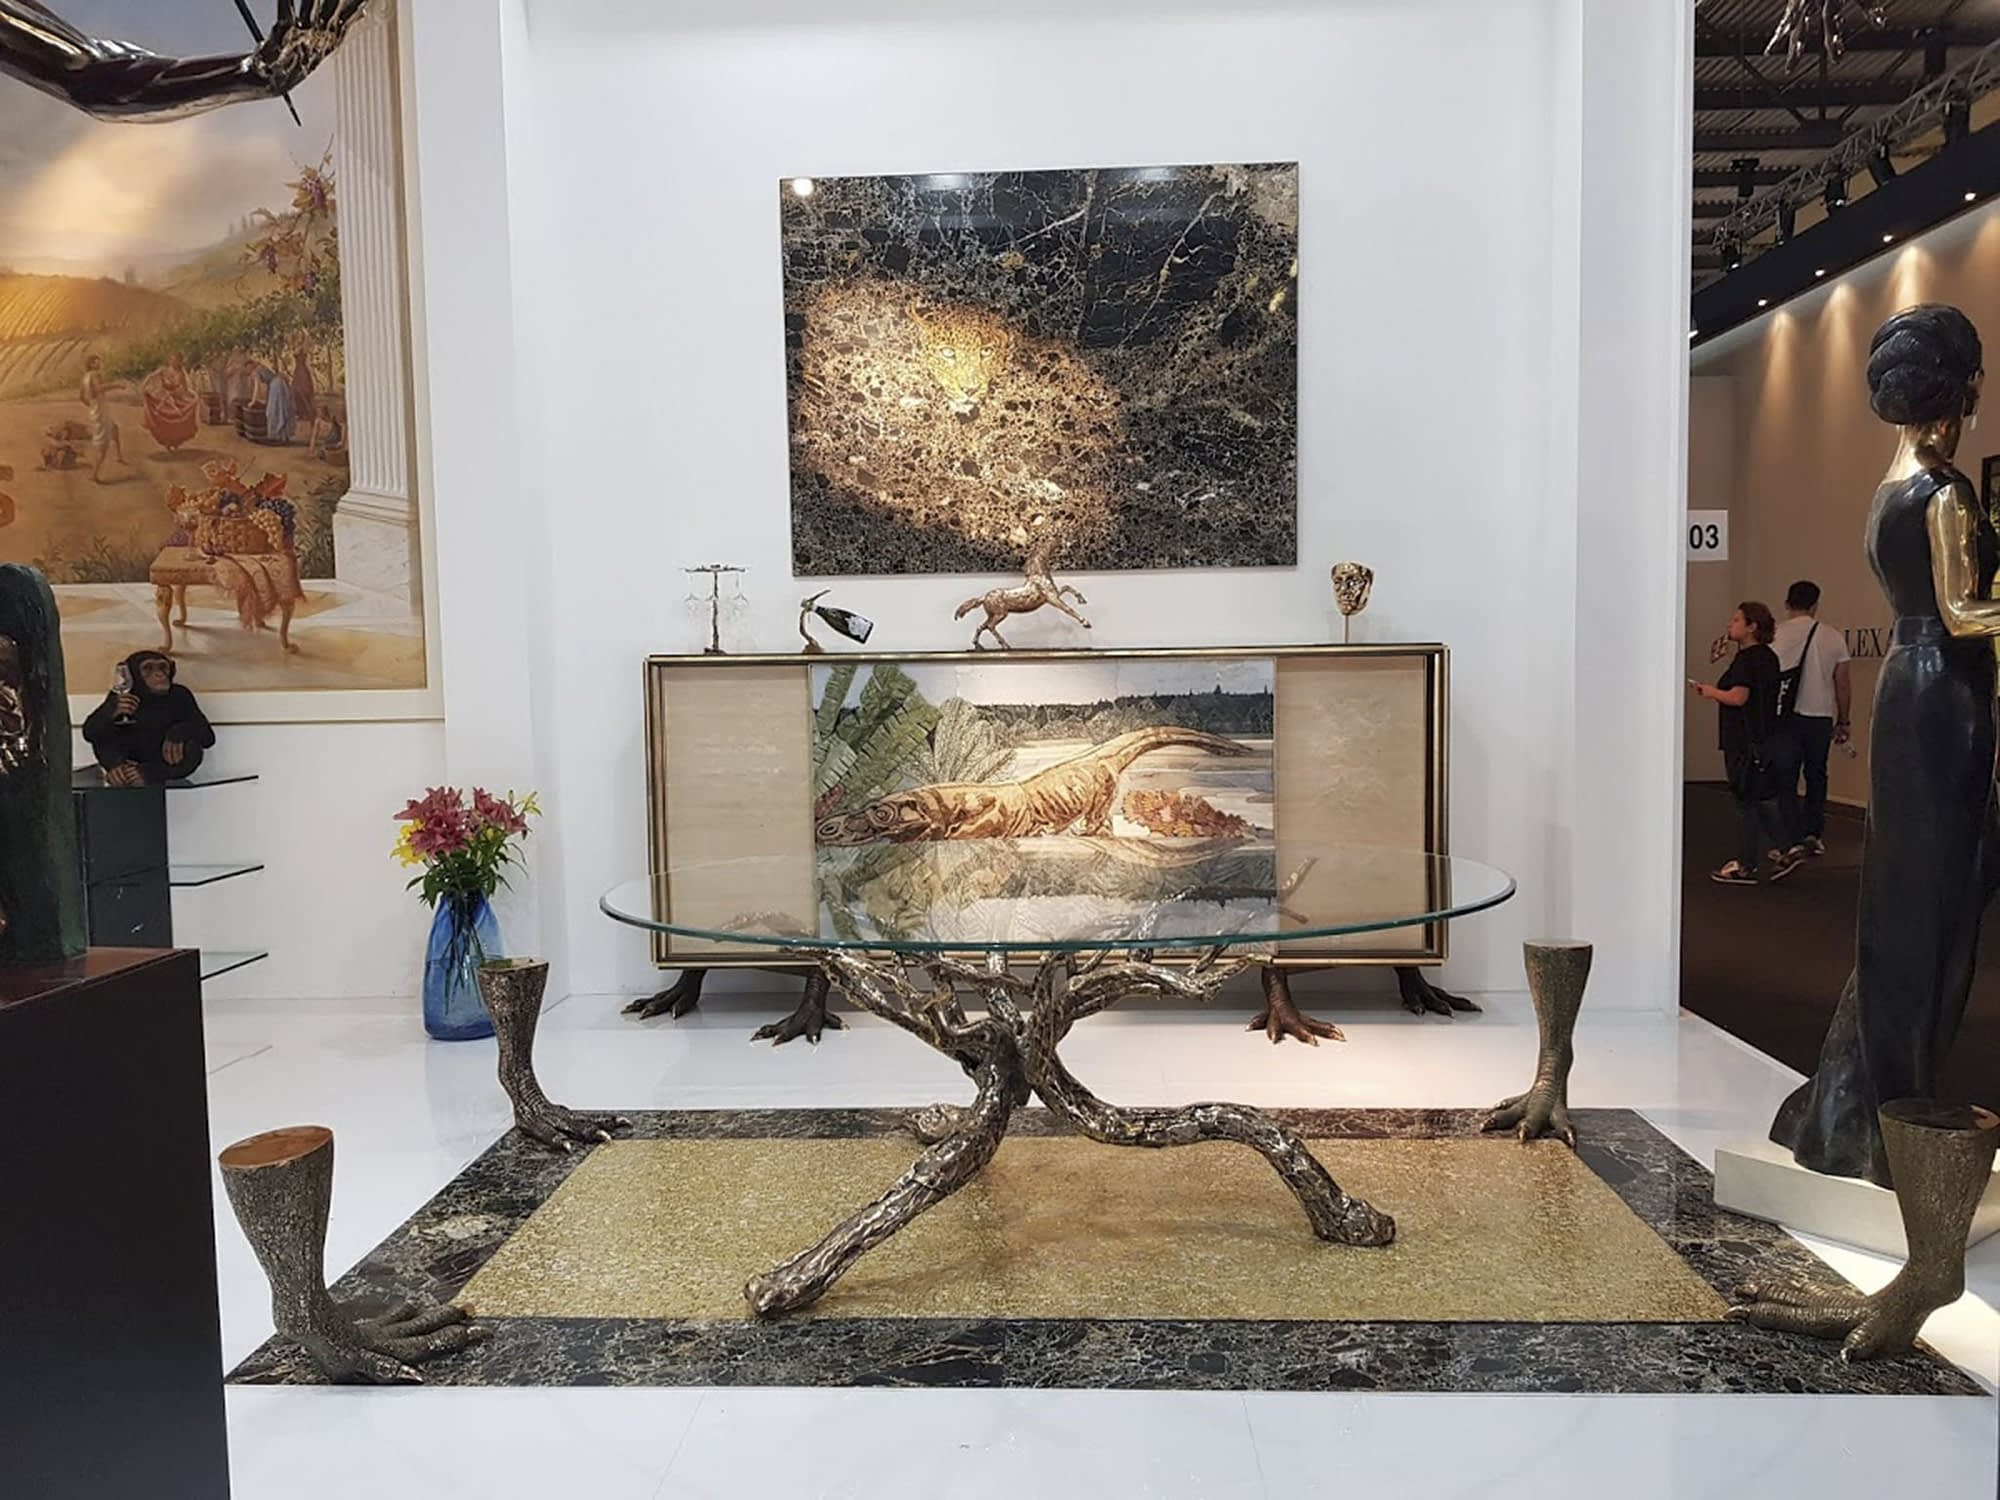 Milano Design Week 2018 - Salone del Mobile 27